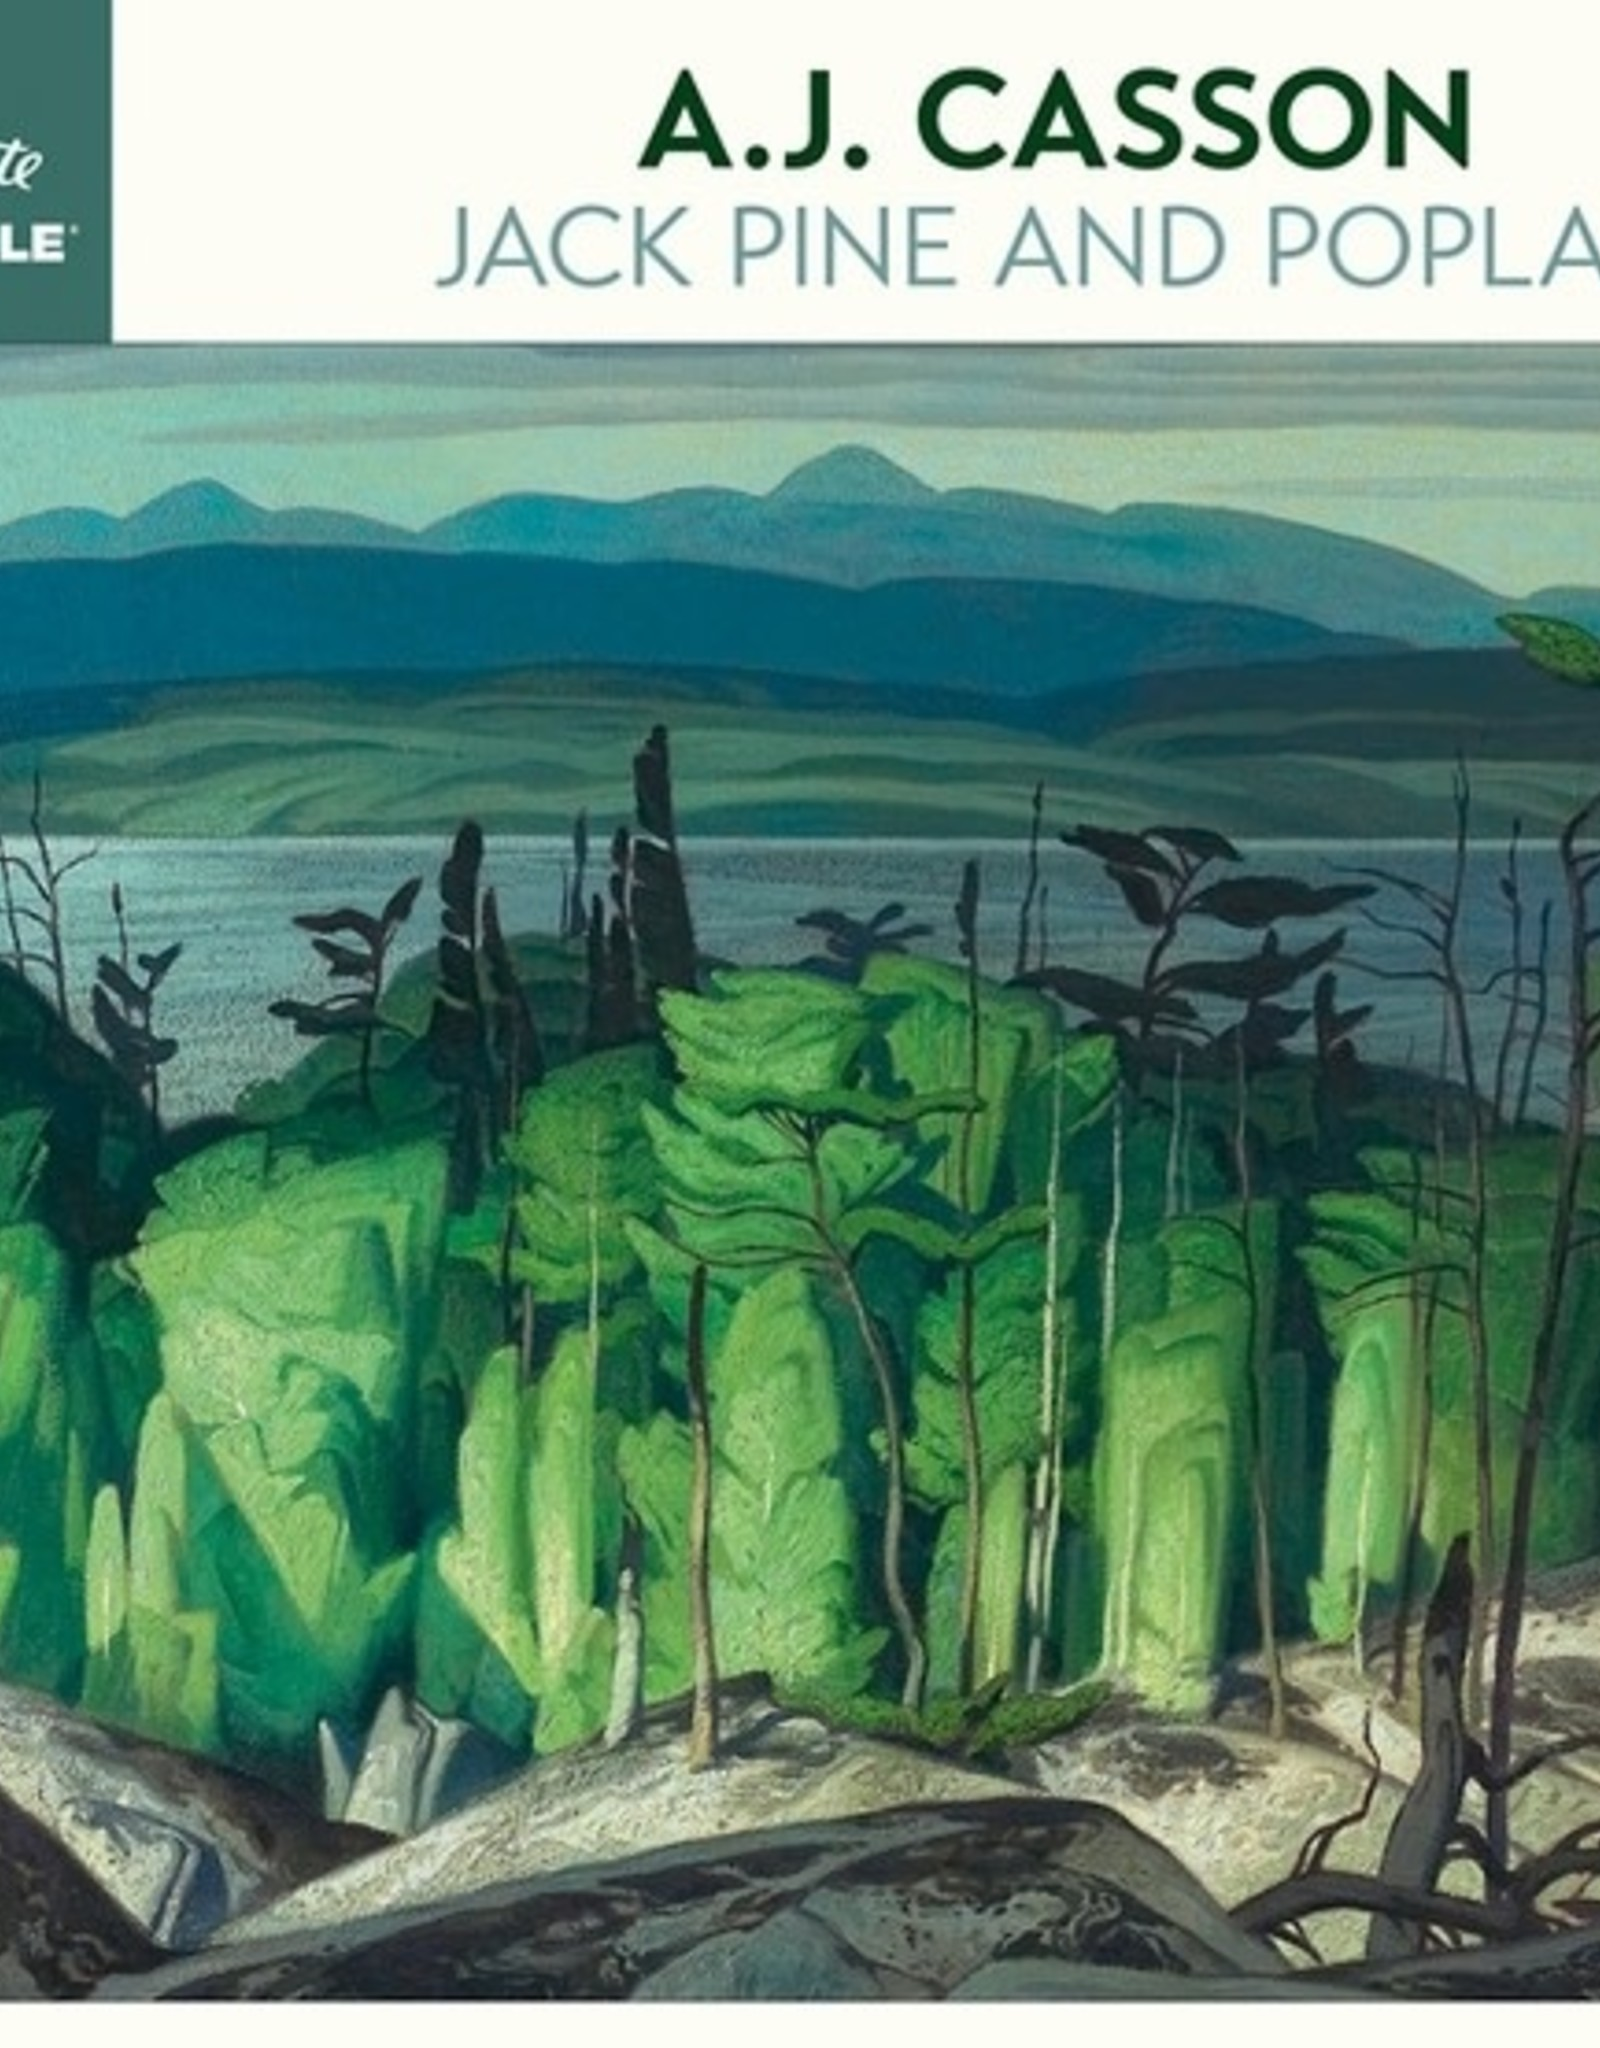 Pomegranate 1000 pc A.J. Casson: Jack Pine and Poplar Puzzle